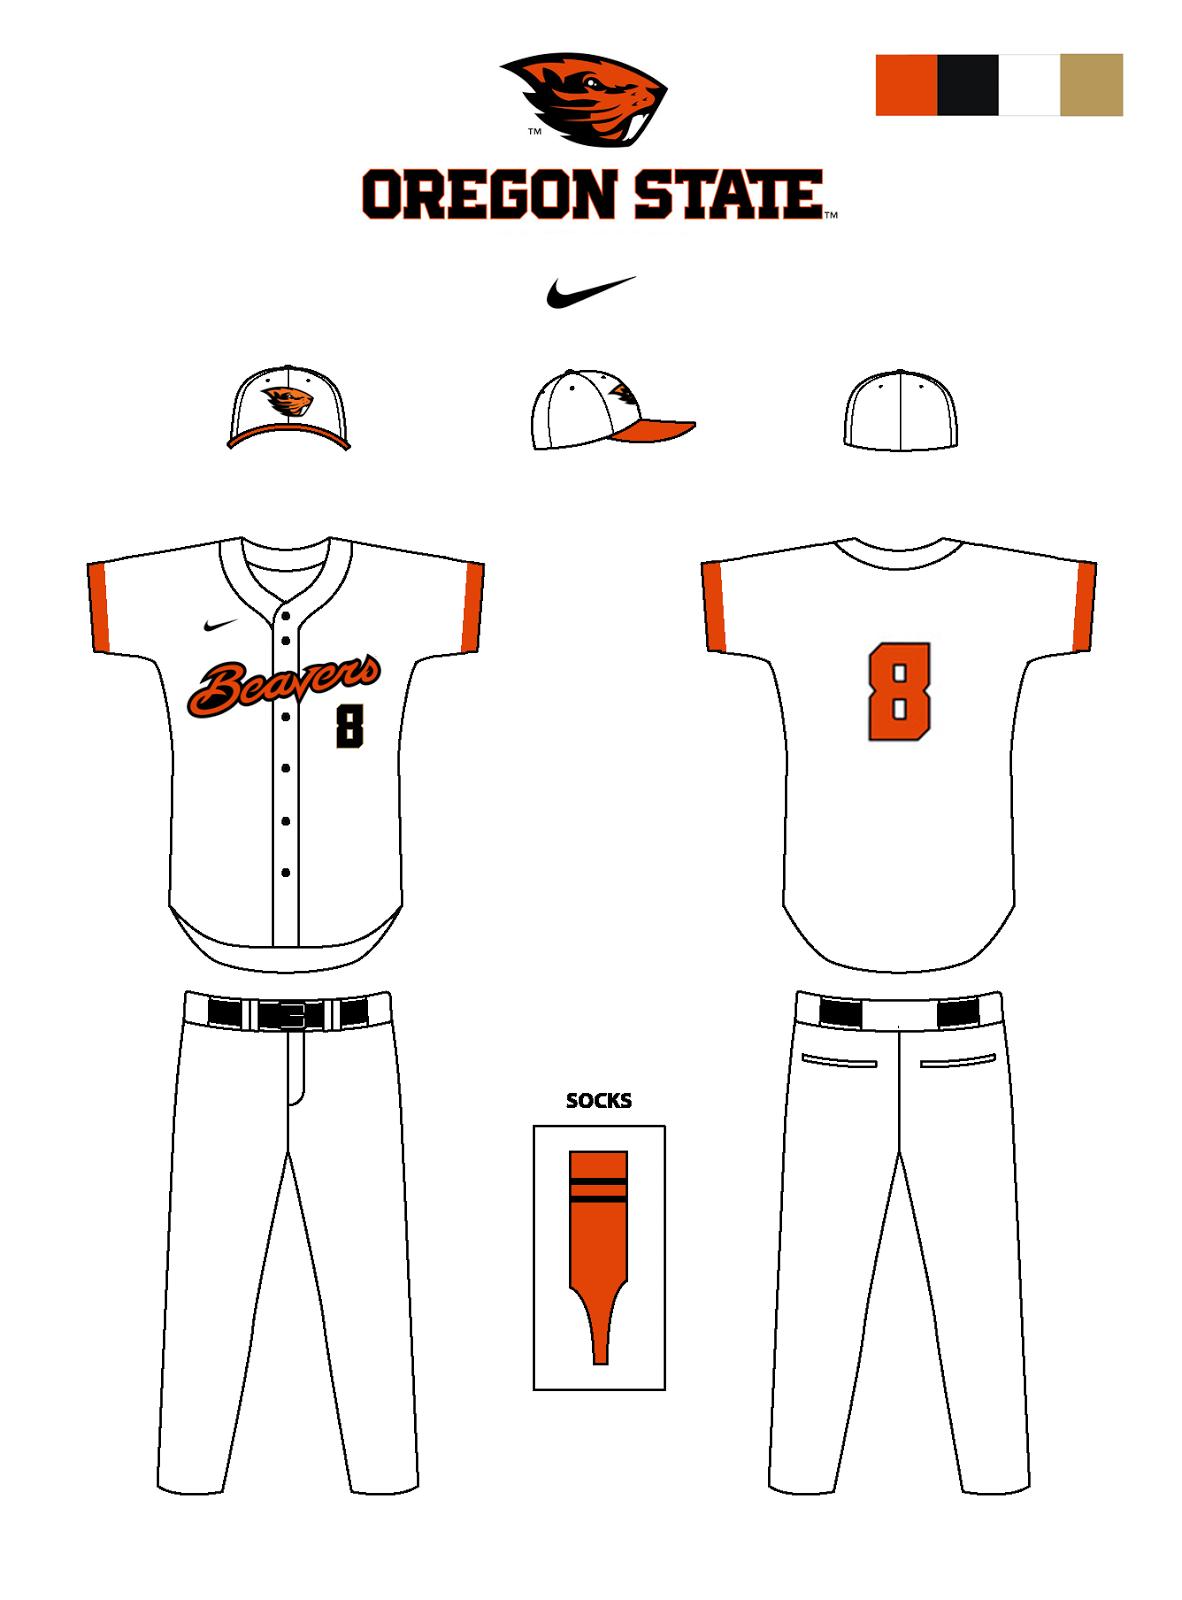 Oregon State Baseball Uniforms Concepts Chris Creamer